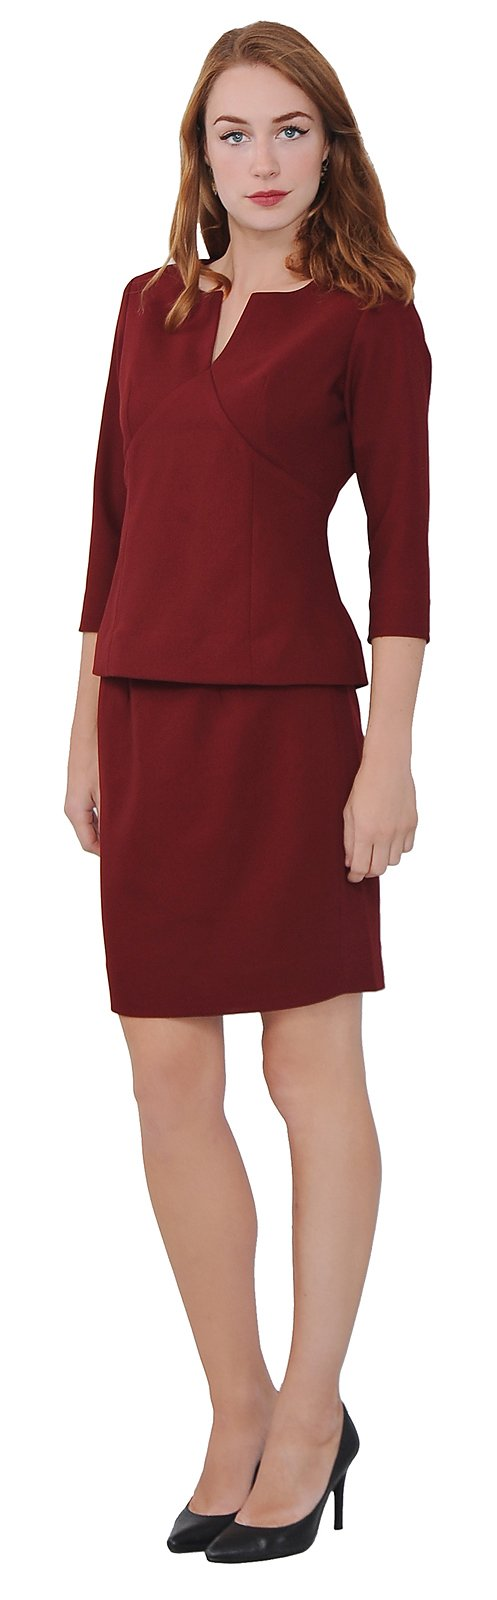 Marycrafts Women's Elegant Skirt Suit Set Work Office Business Wear 12 Burgundy